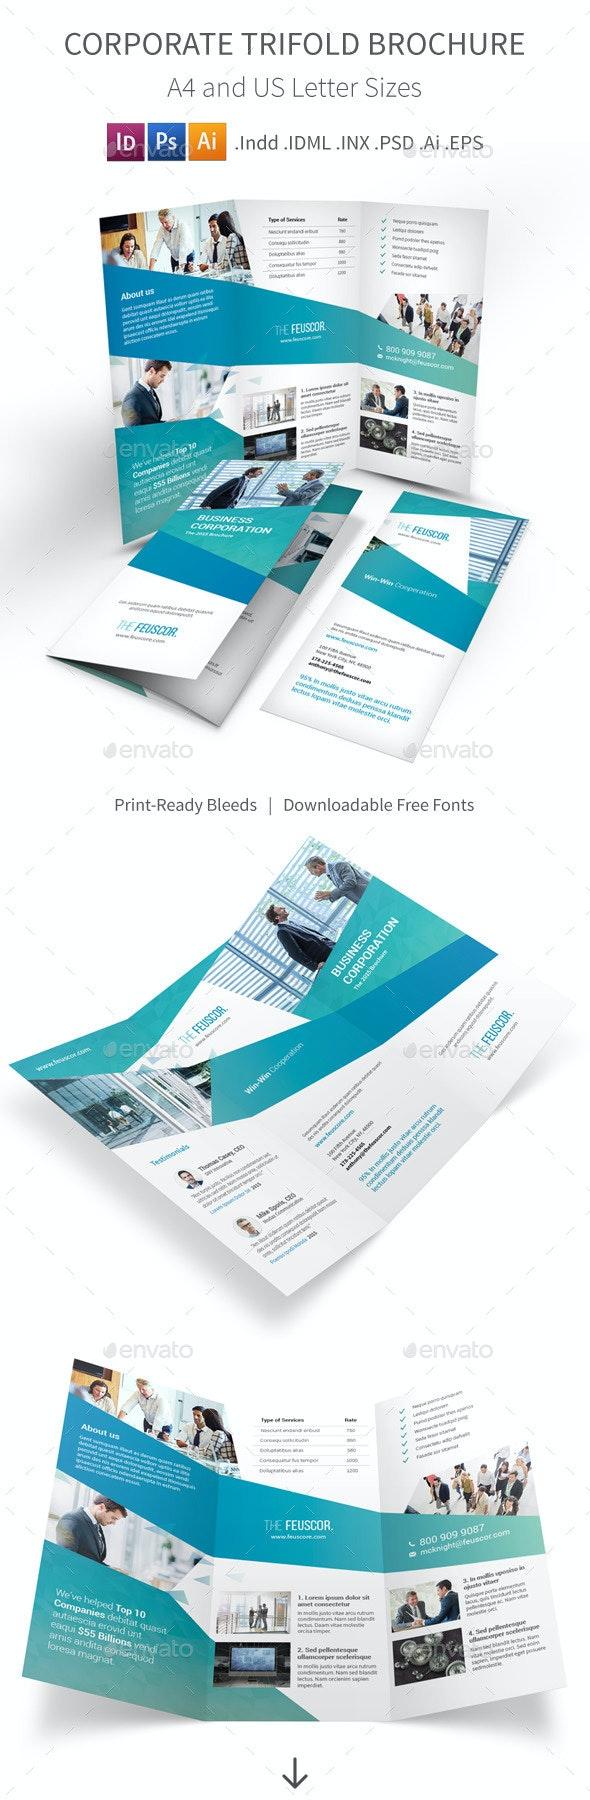 Corporate Company Trifold Brochure - Corporate Brochures